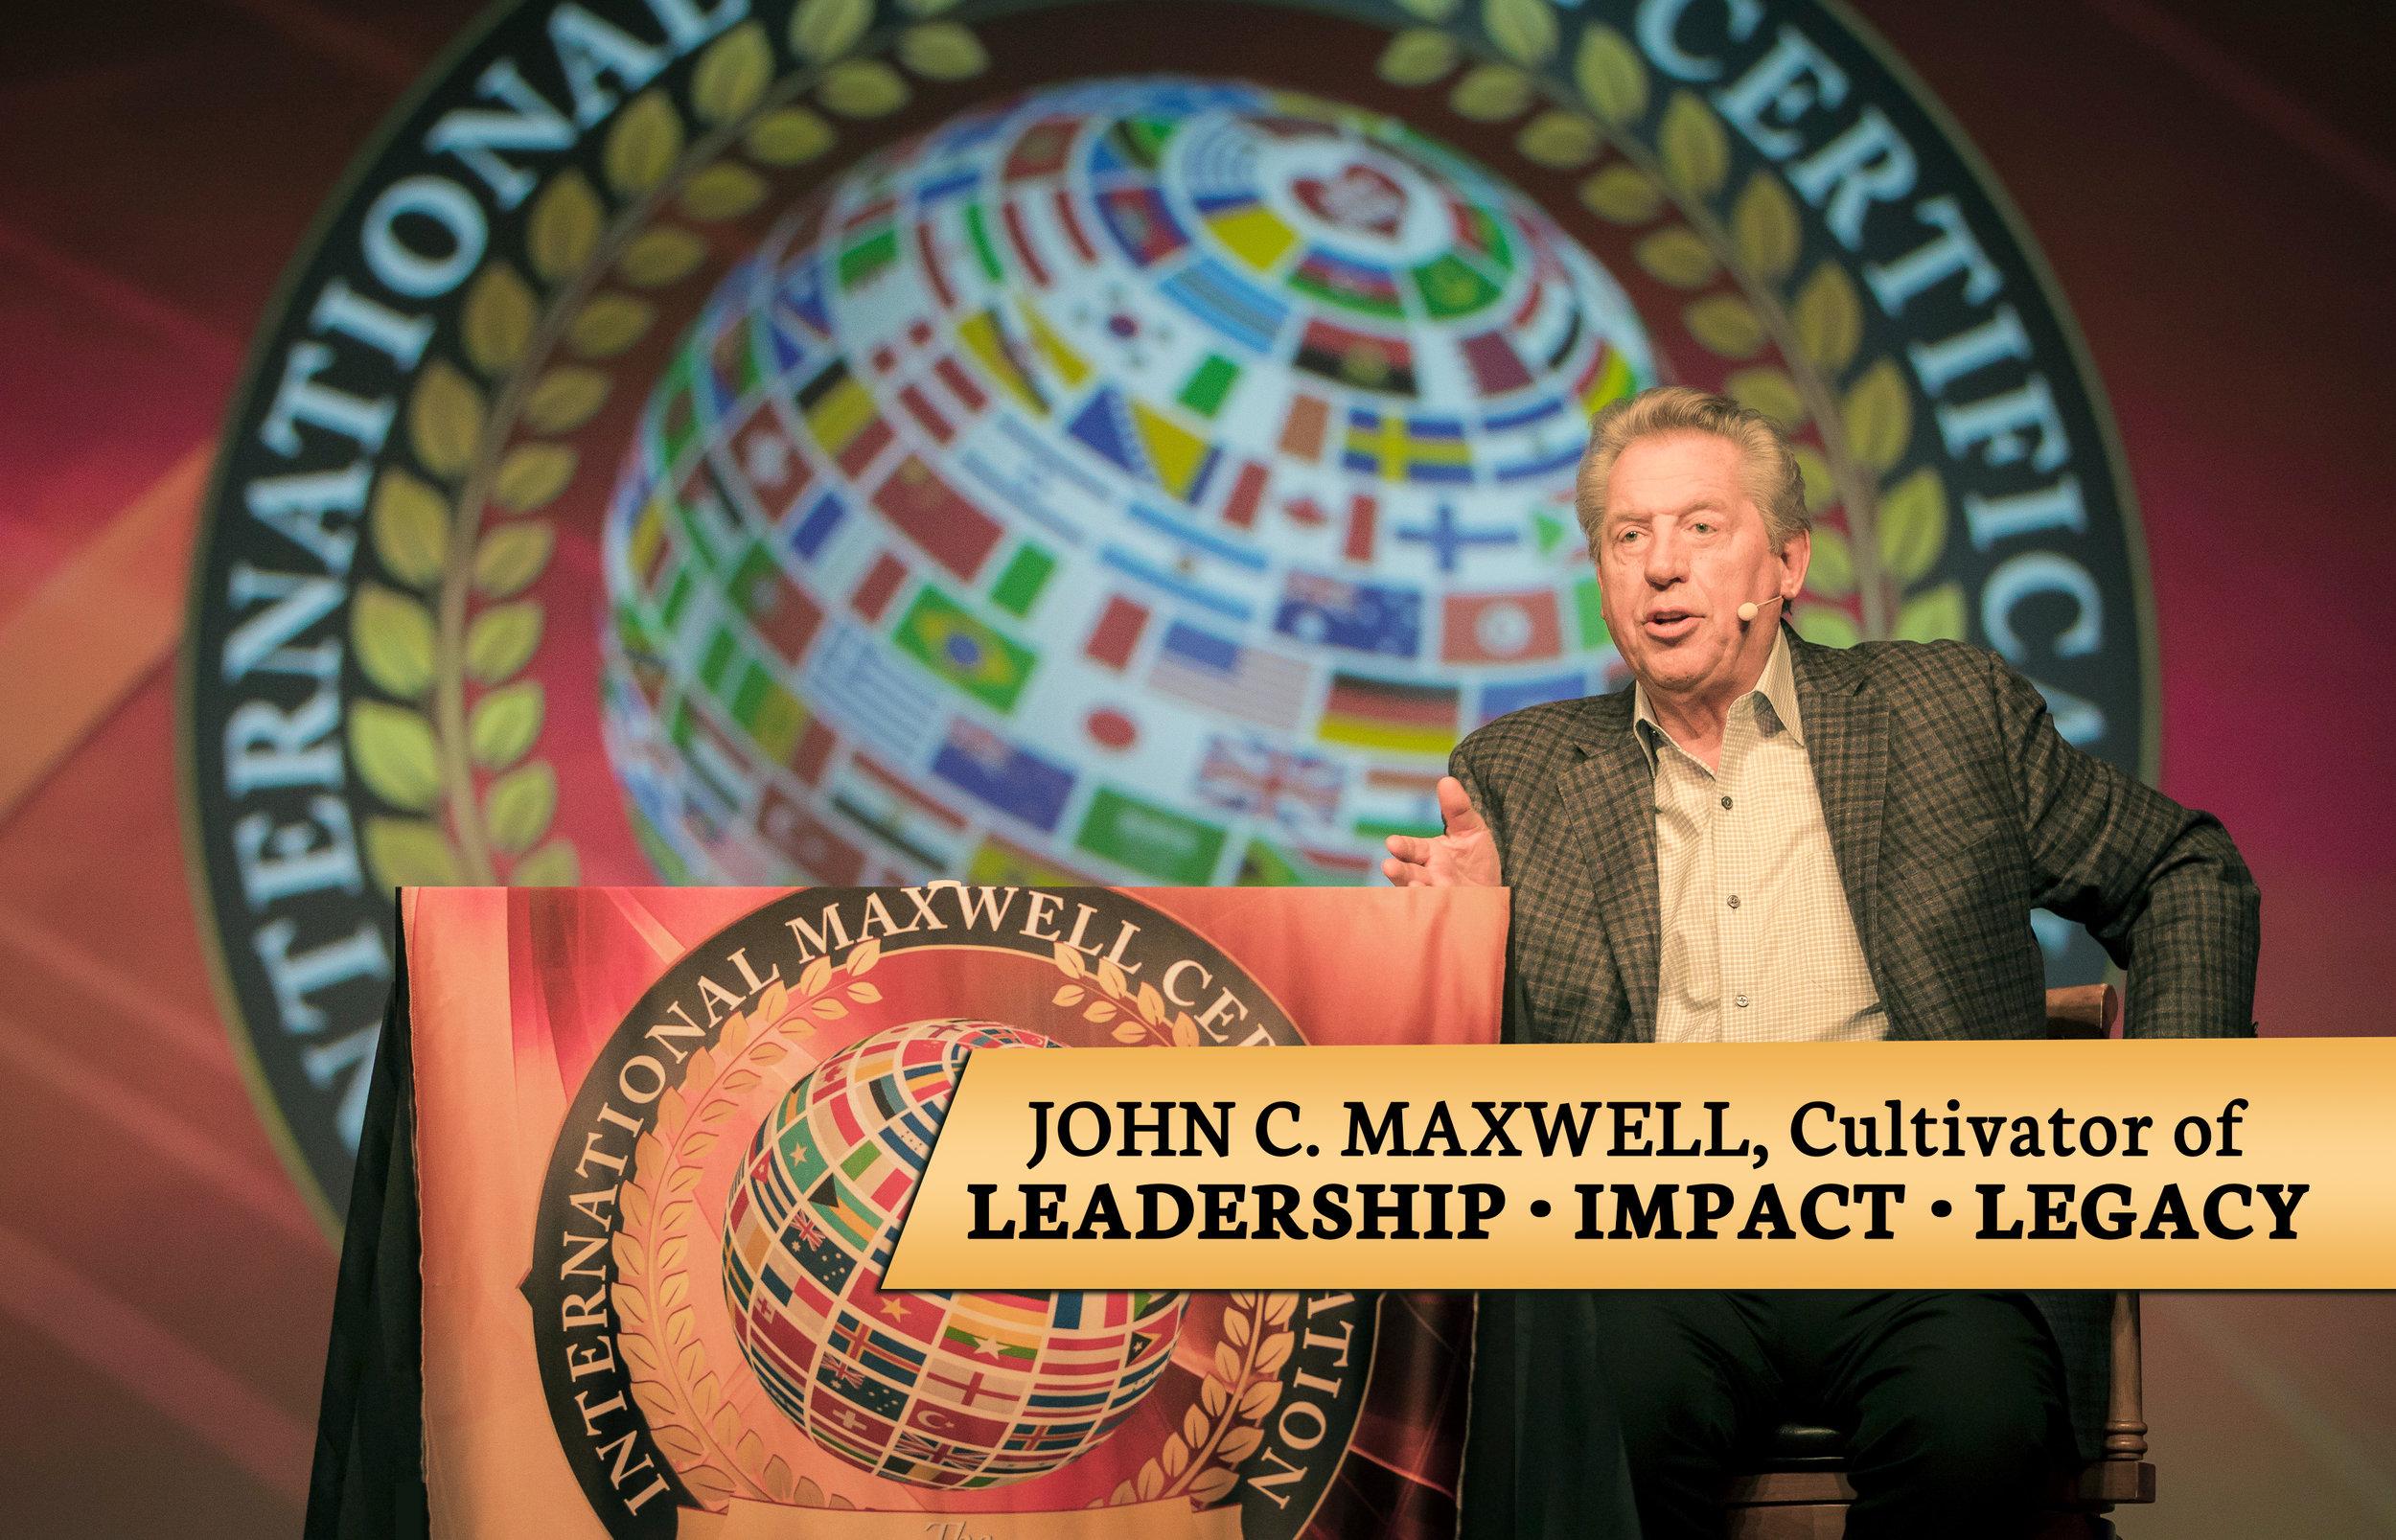 JohnMaxwell_LeadershipDevelopment.jpg